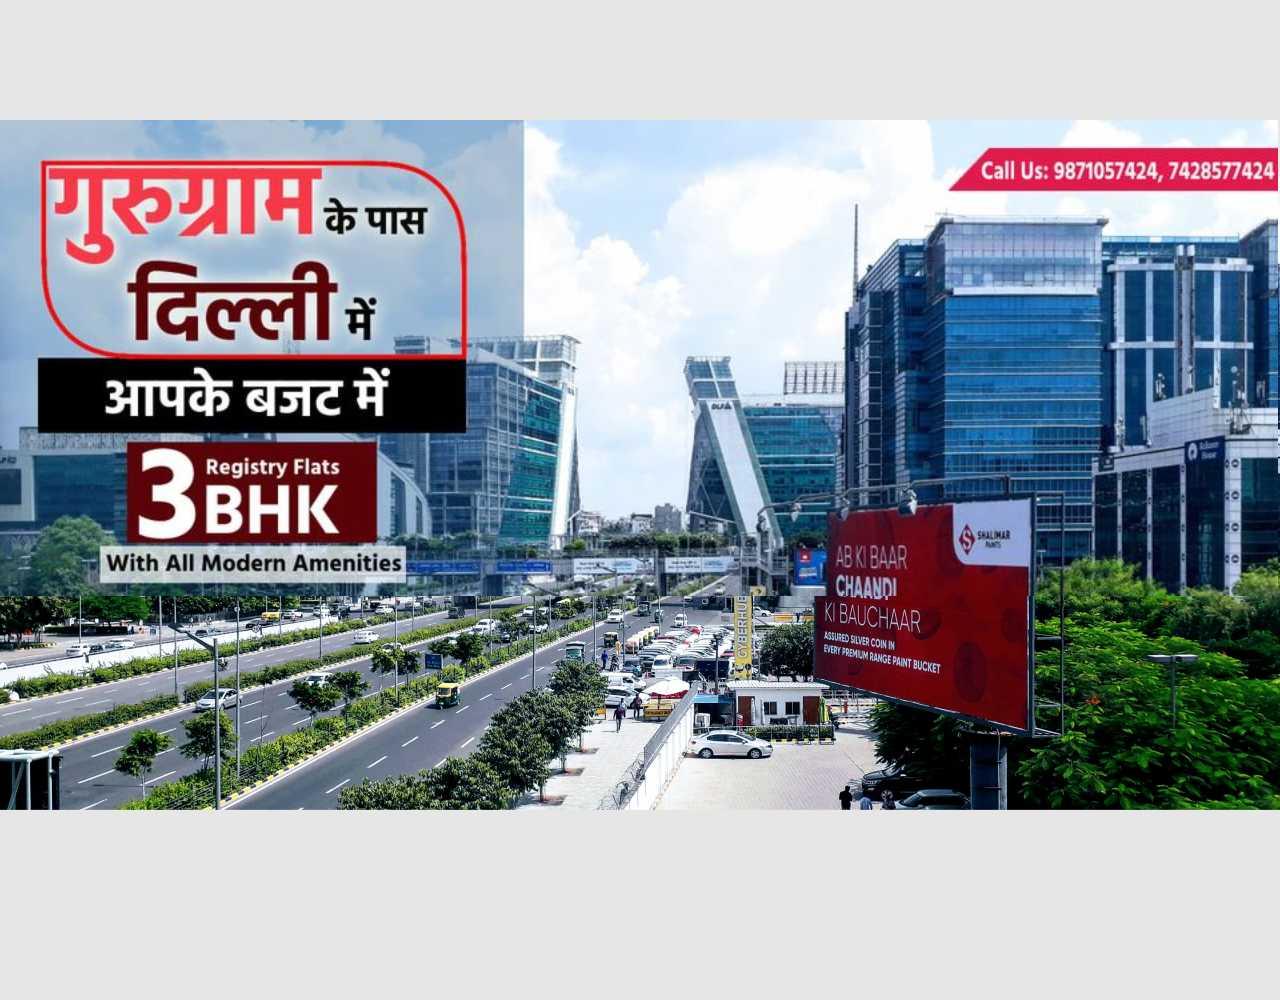 3 BHK Flats Near Gurugram Image